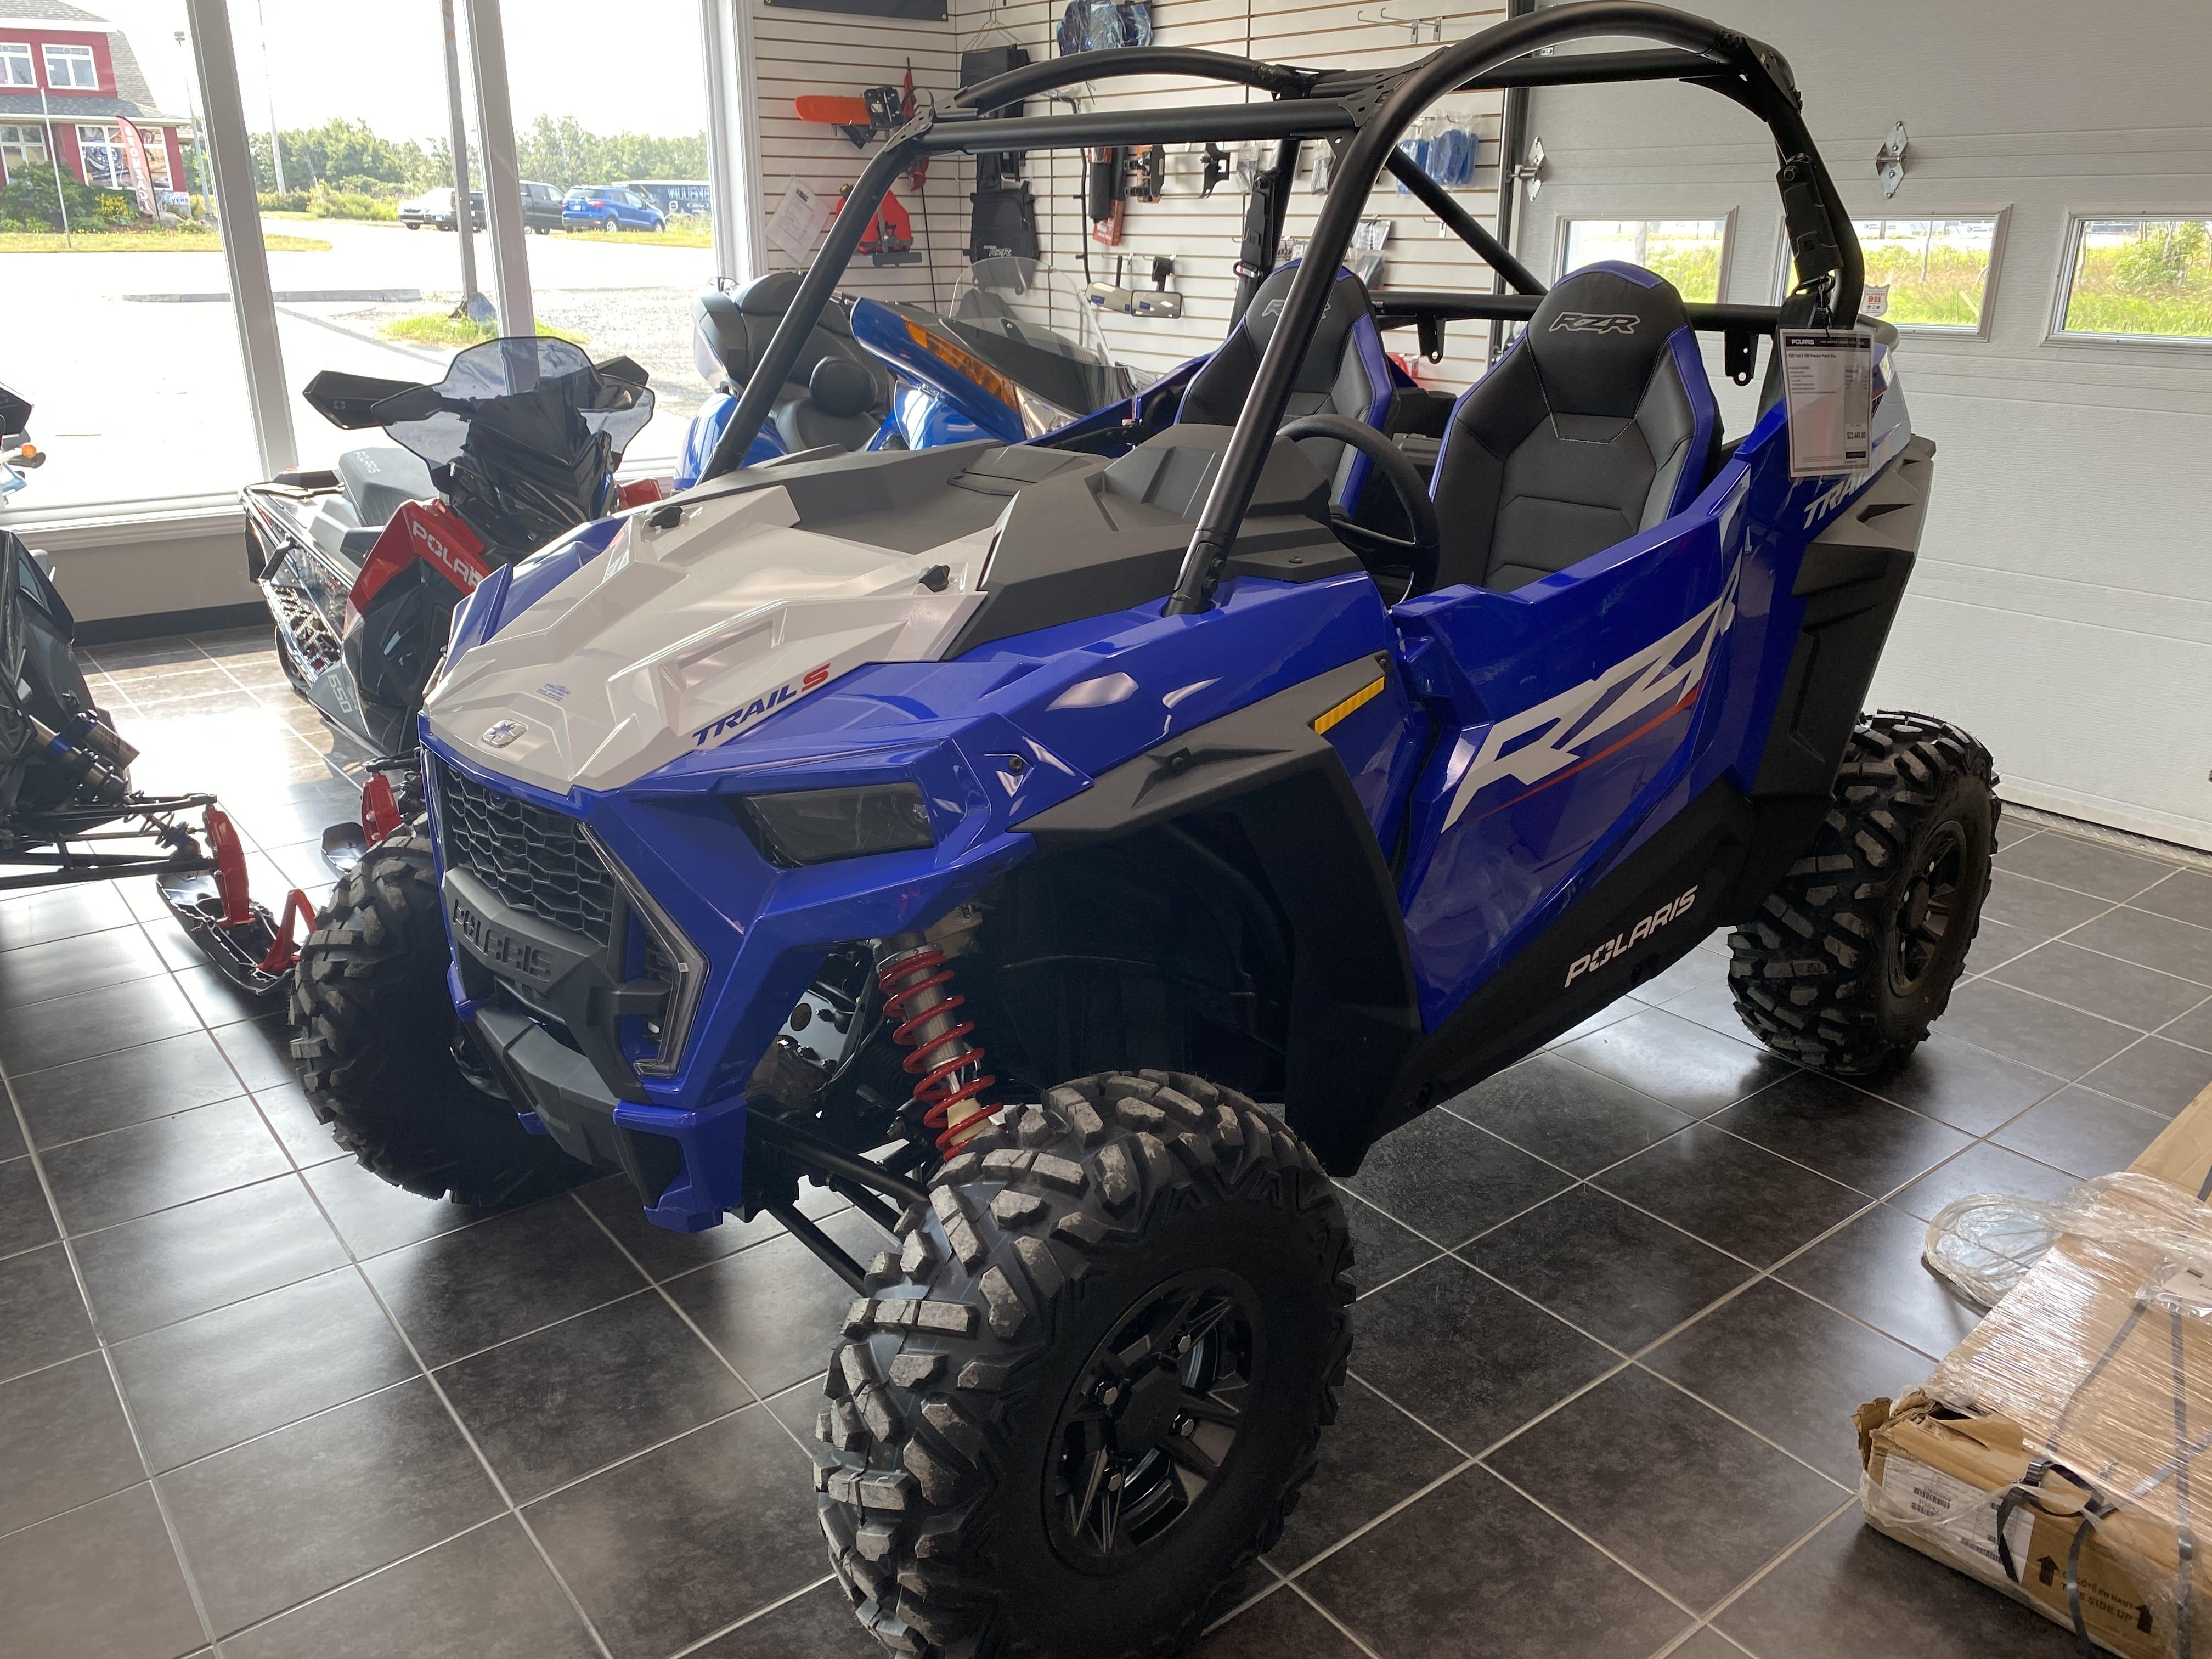 Boutique de la moto a Matane2022 POLARIS RZR TRAIL S 1000 PREMIUM - POLARIS BLUE